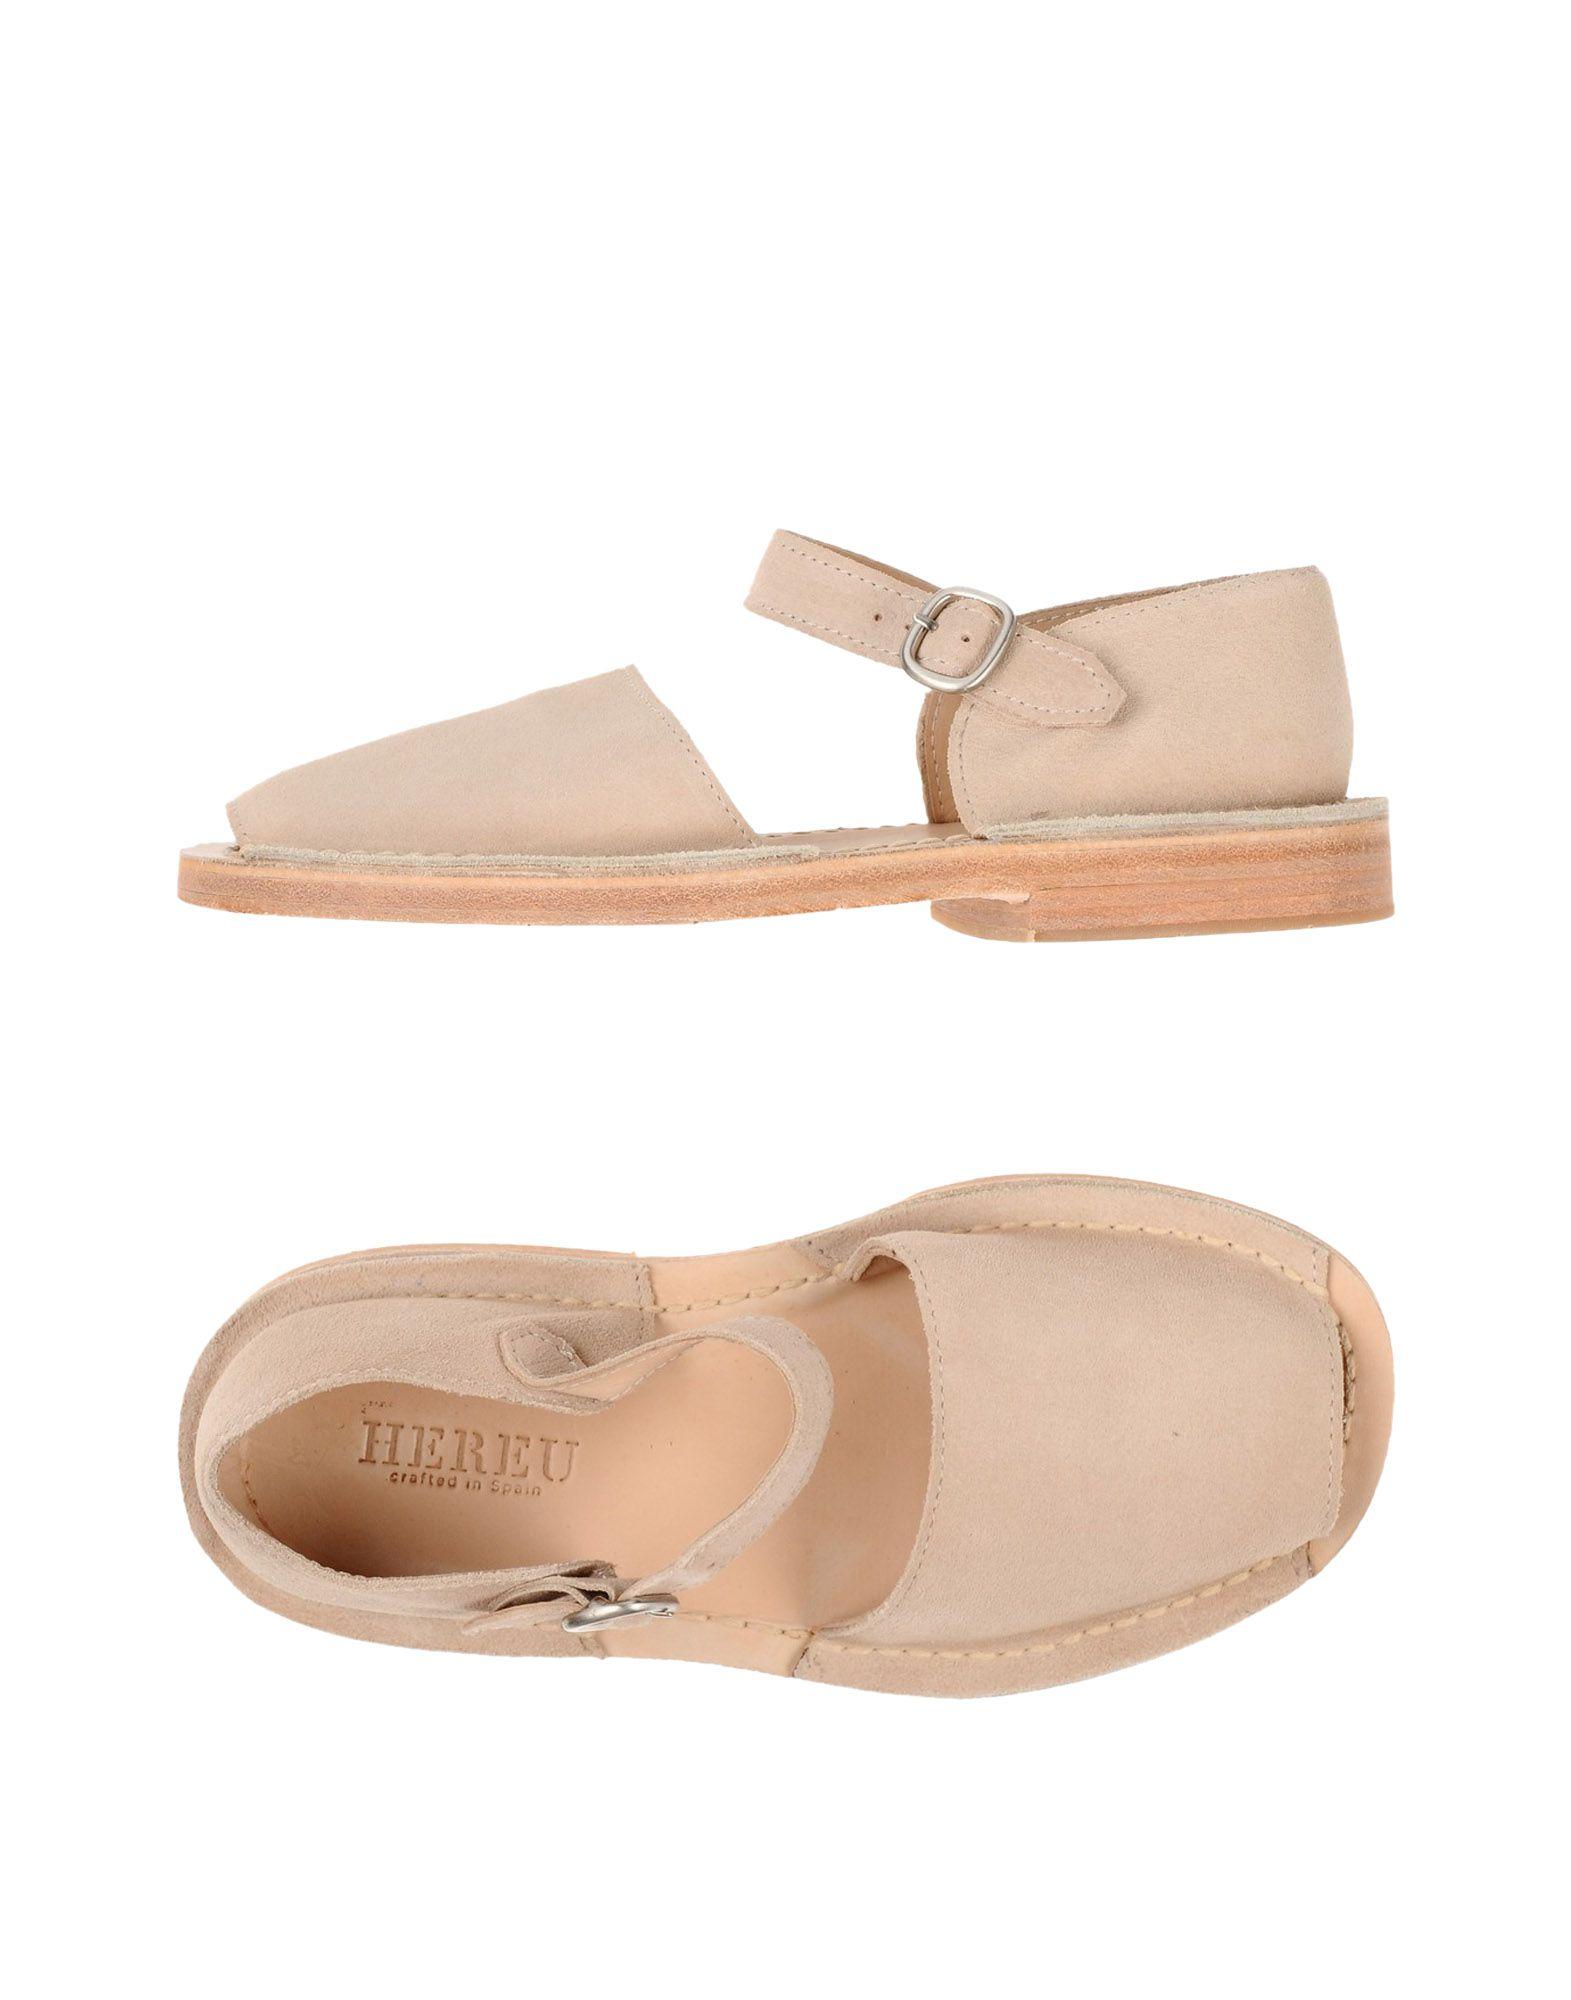 HEREU Sandals in Beige